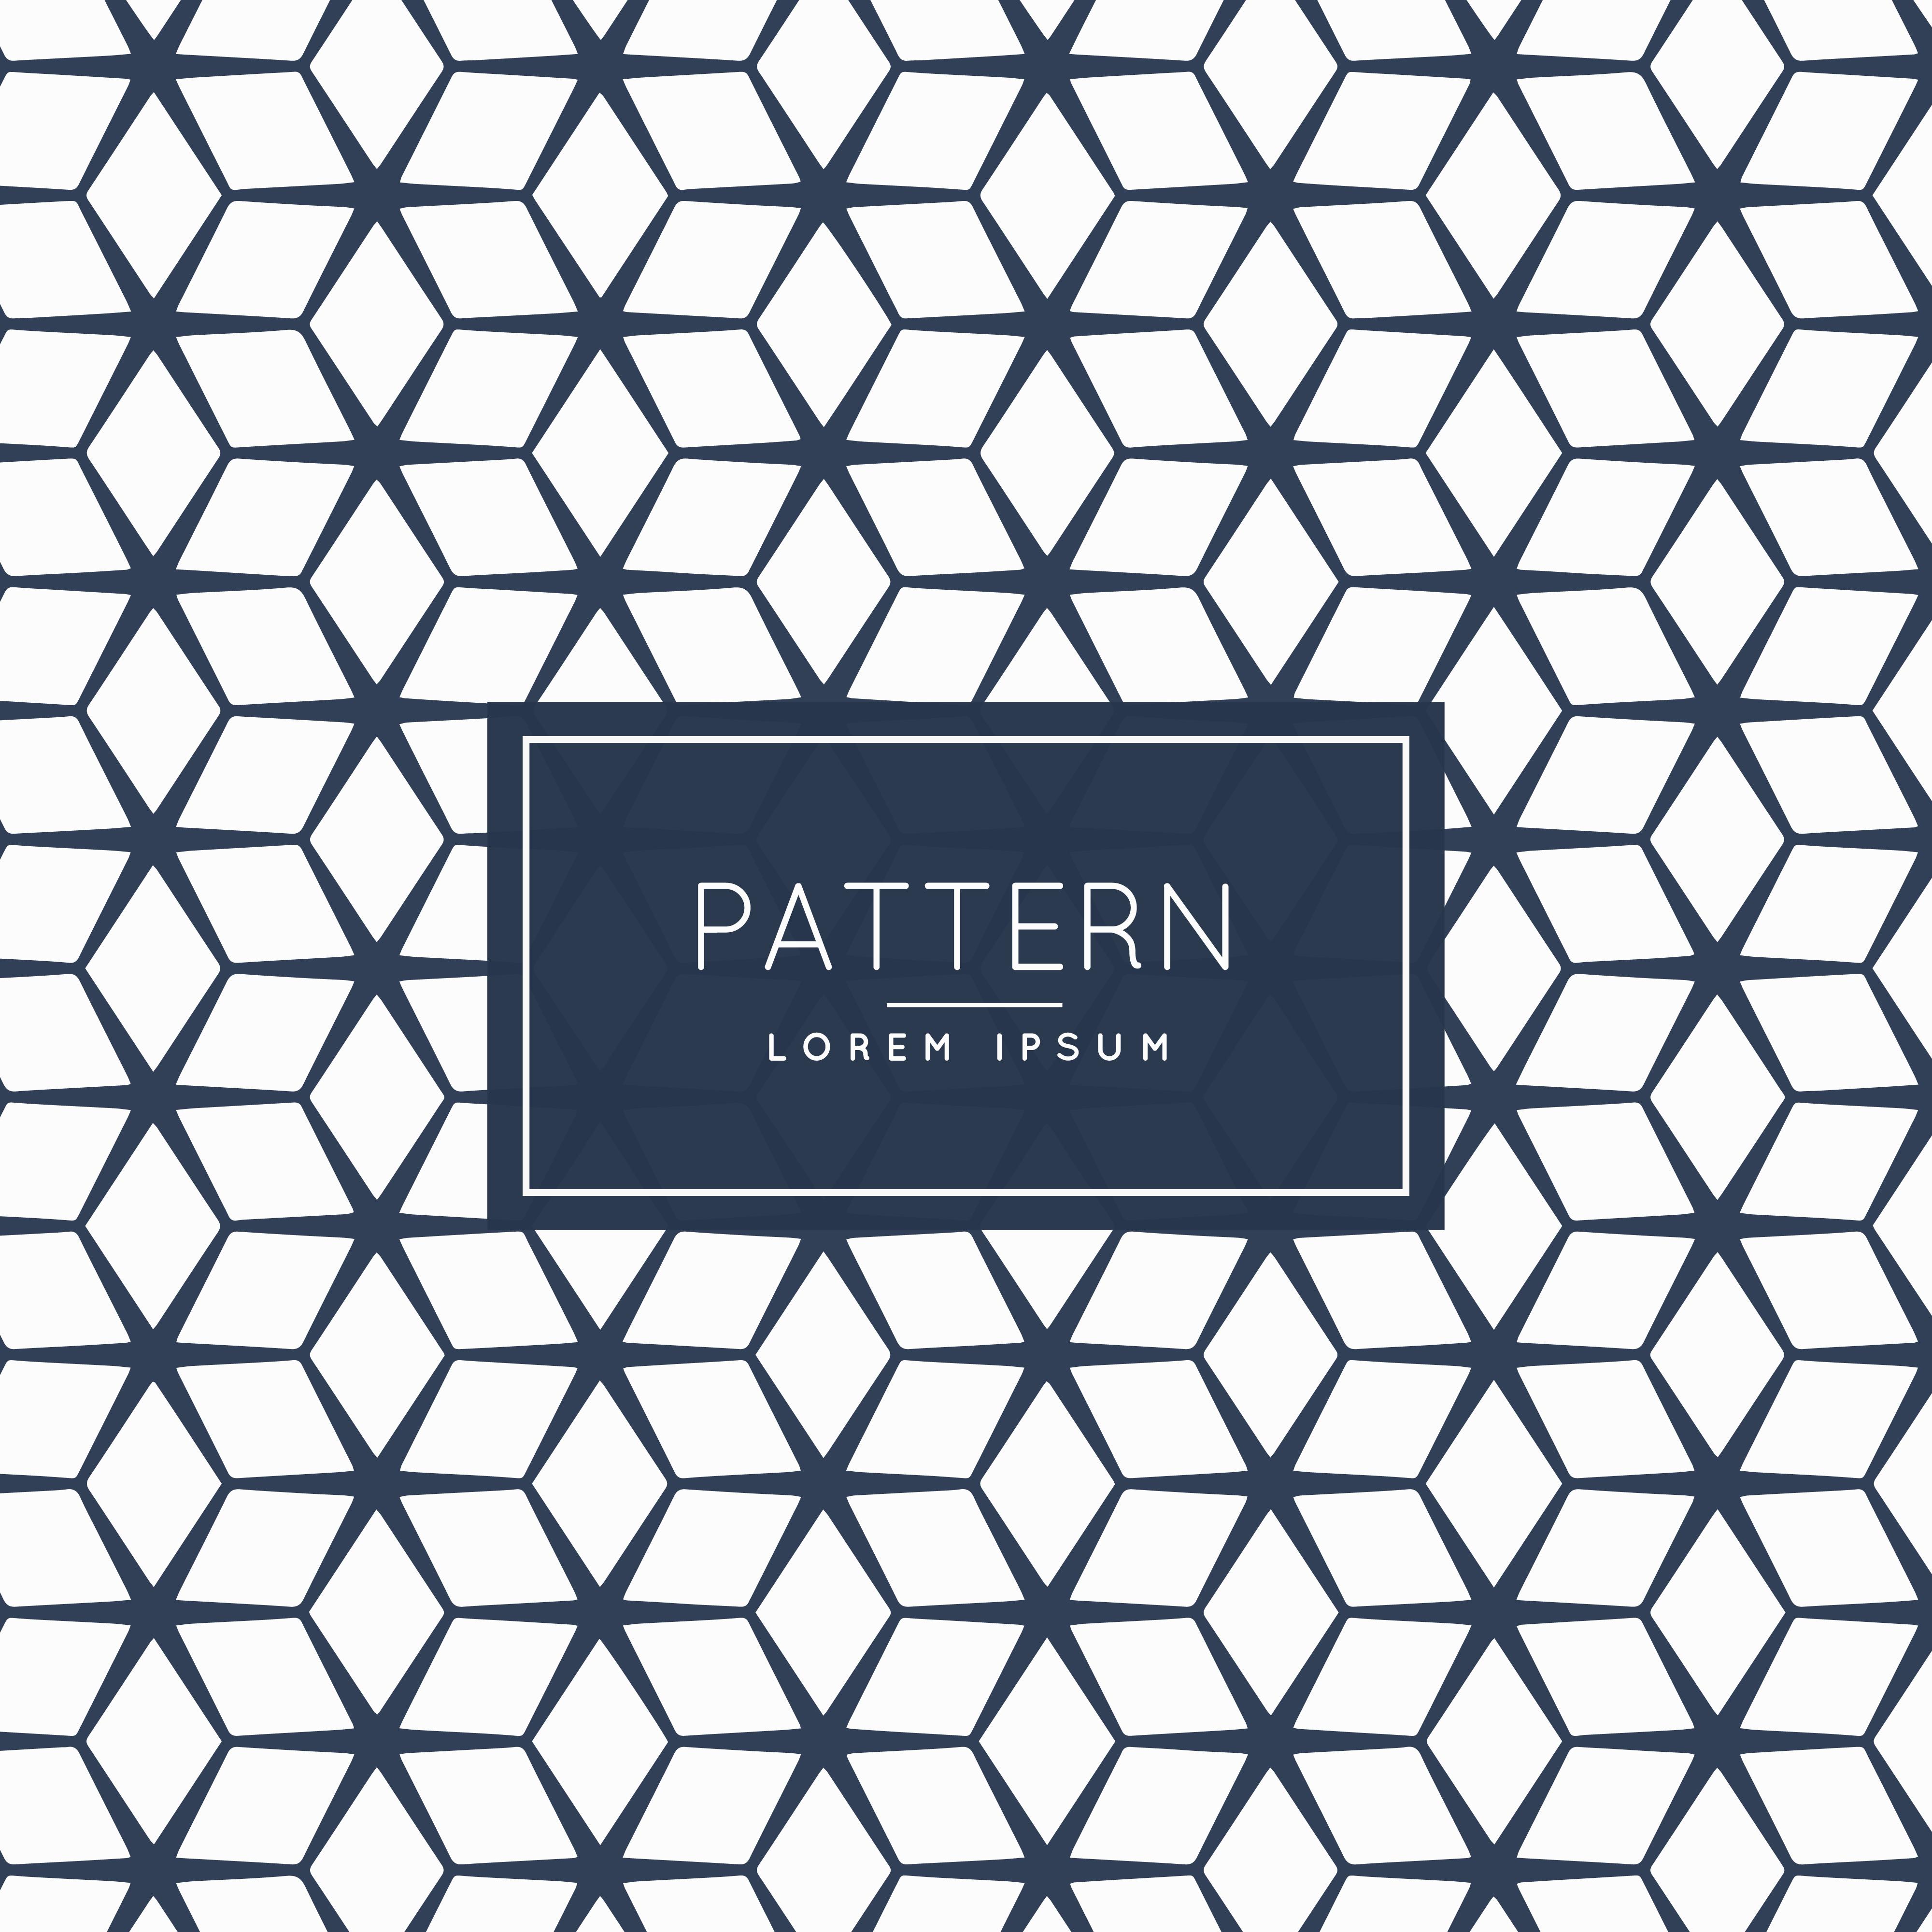 Minimal pattern background download free vector art for Minimal art vector